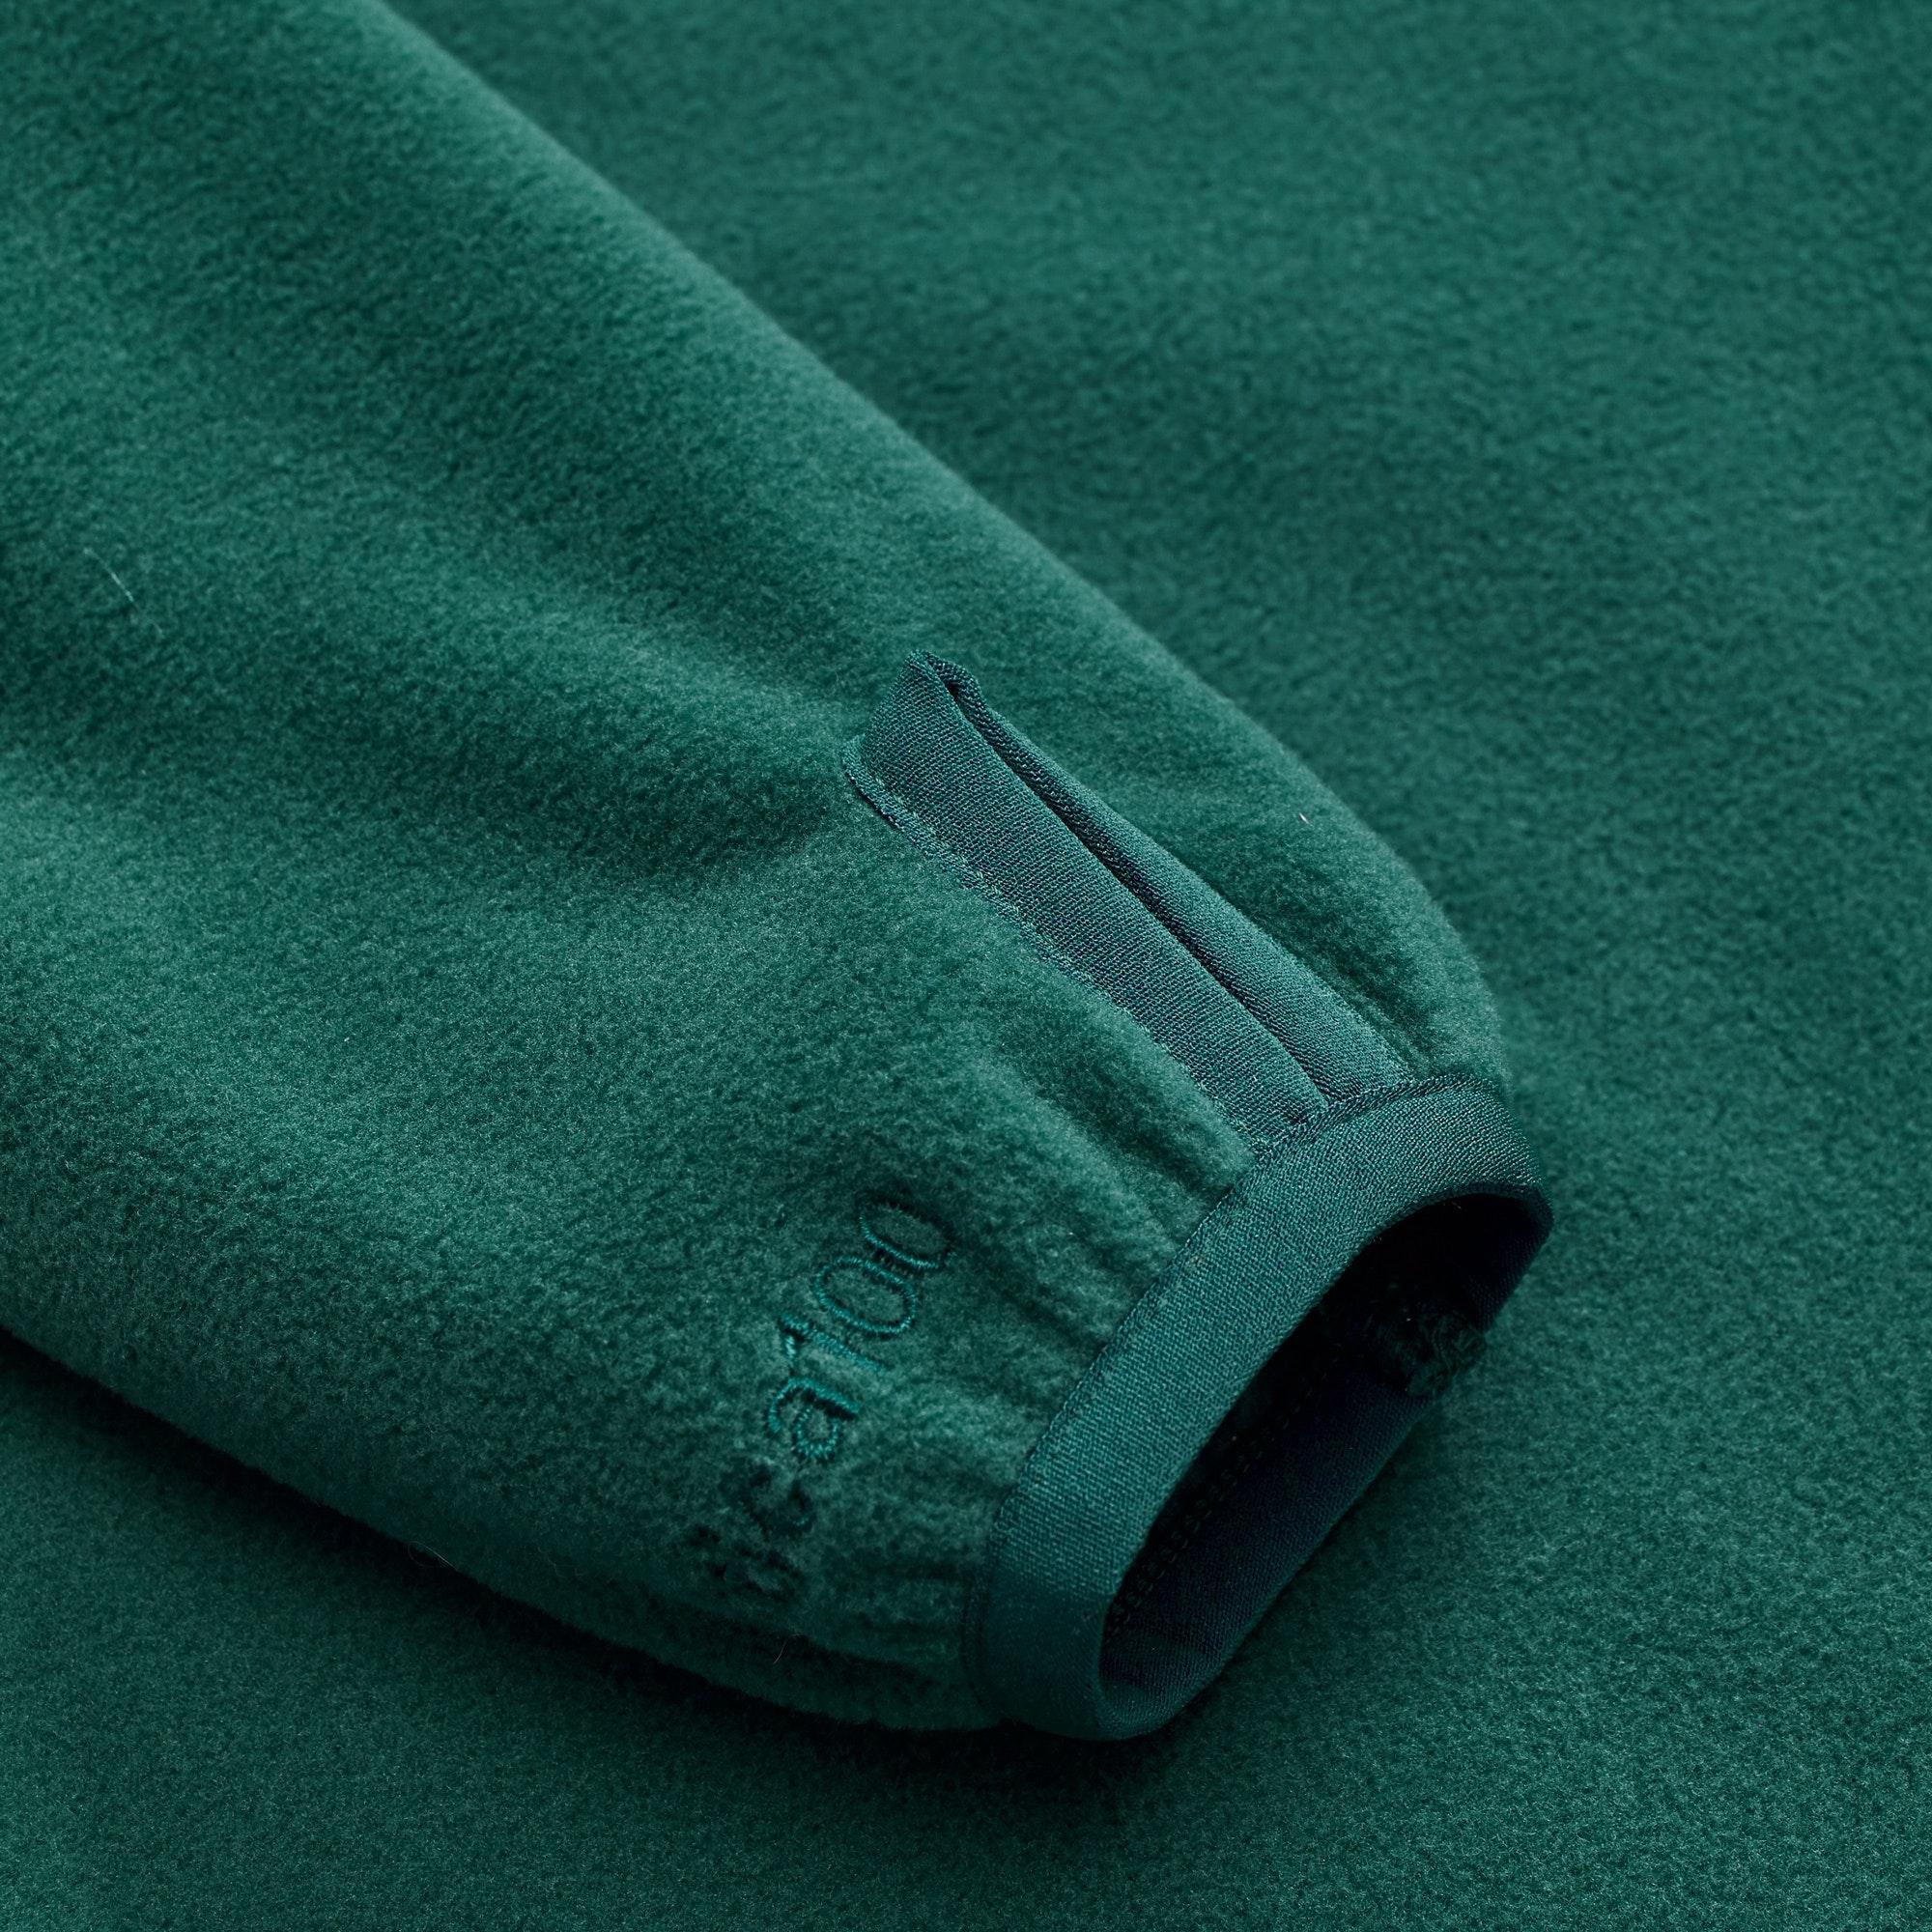 NEW-Kathmandu-Ridge-Kids-039-Girls-039-Boys-039-Warm-Fleece-Jacket-1-4-Zip-Pullover-Top thumbnail 18